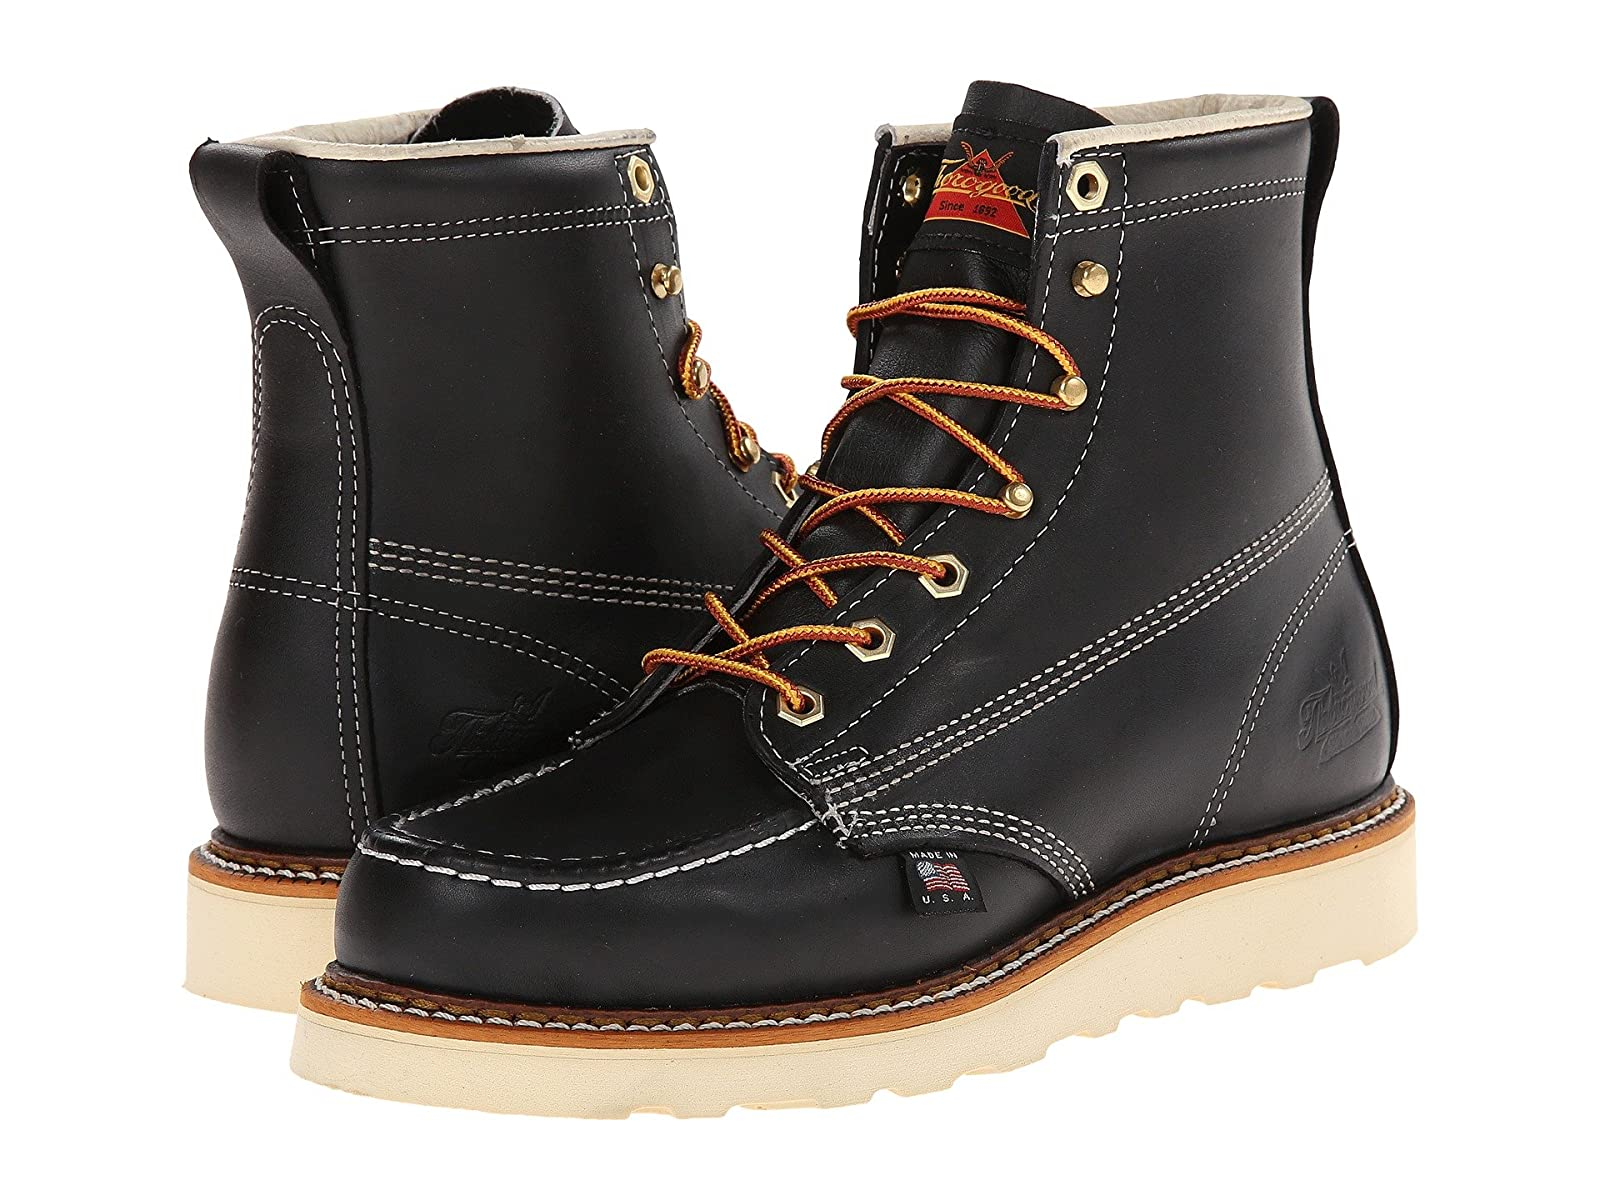 "Thorogood 6"" Black Moc ToeEconomical and quality shoes"